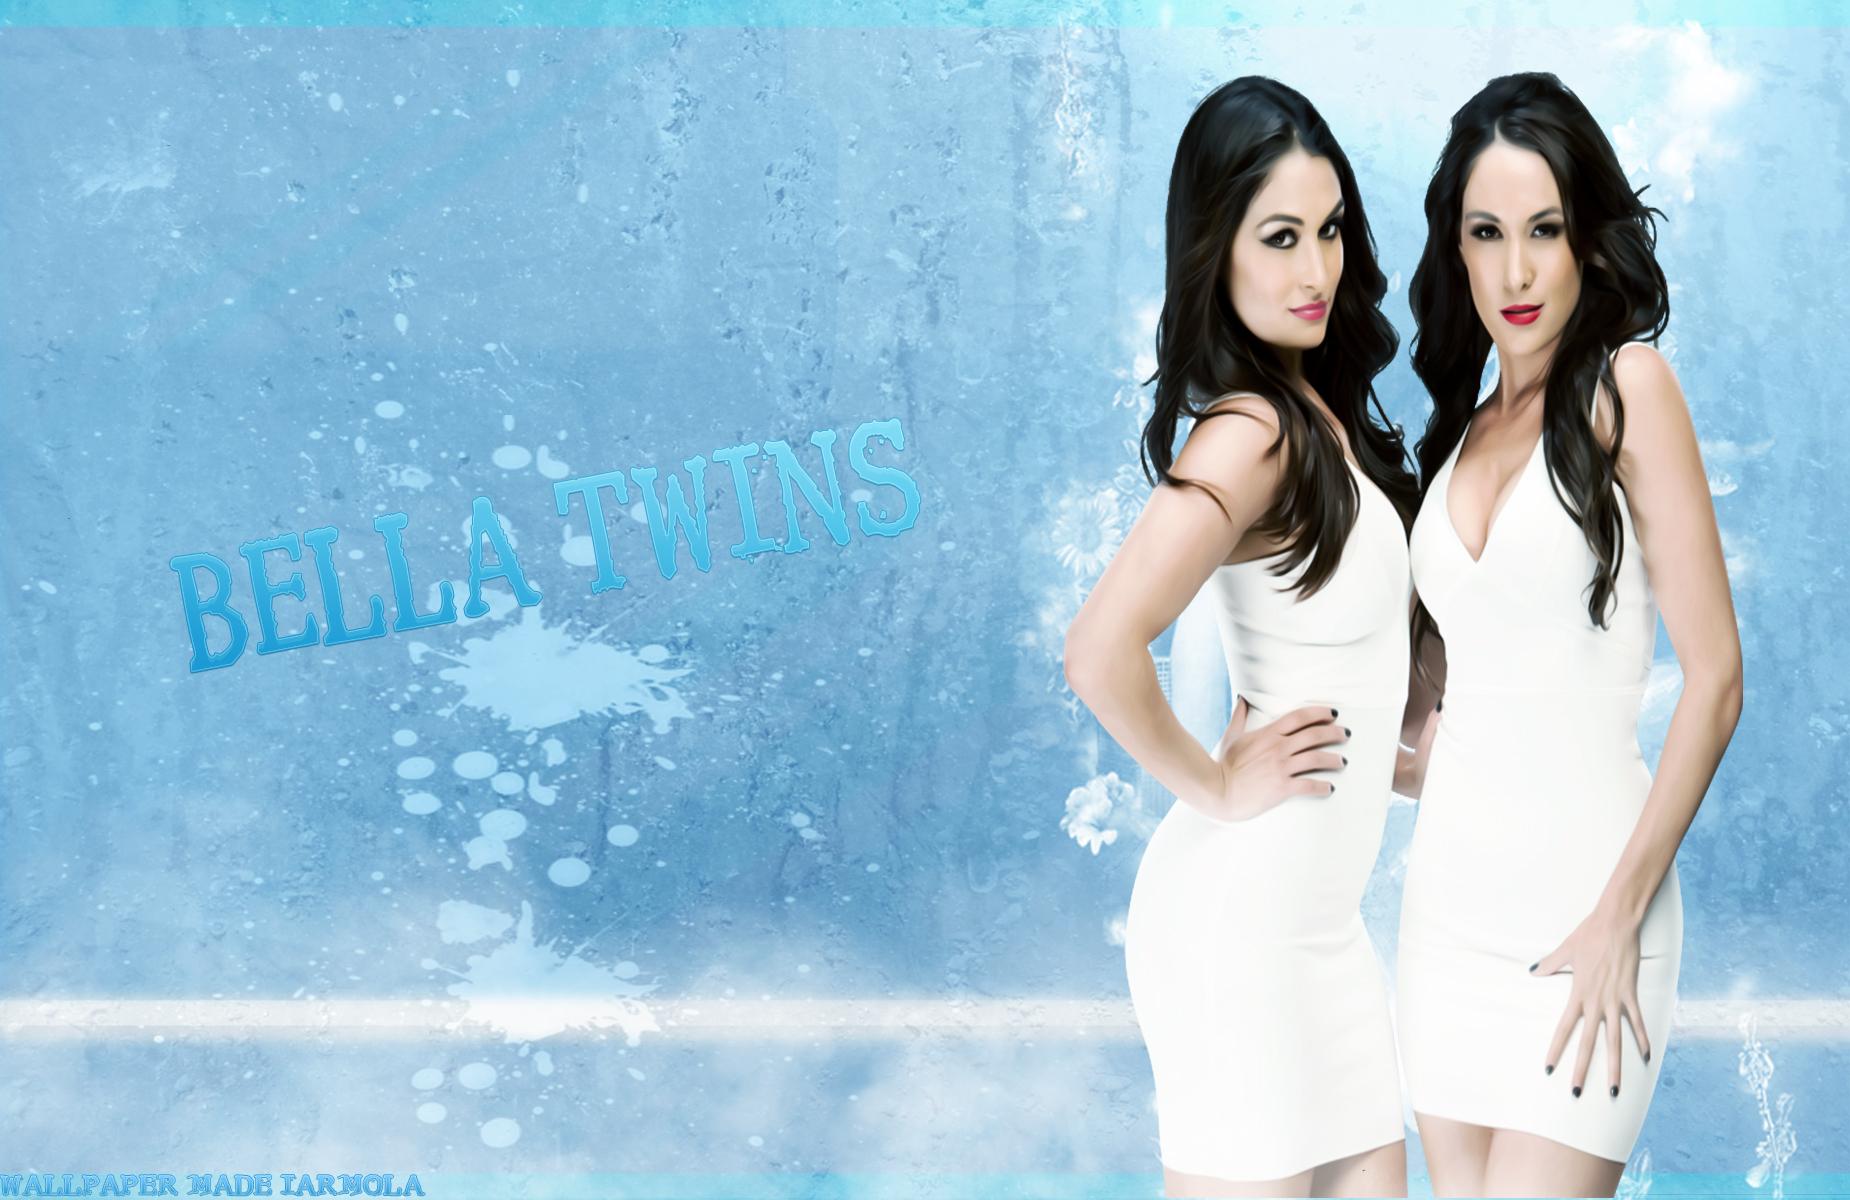 the bella twins wallpaper wallpapersafari